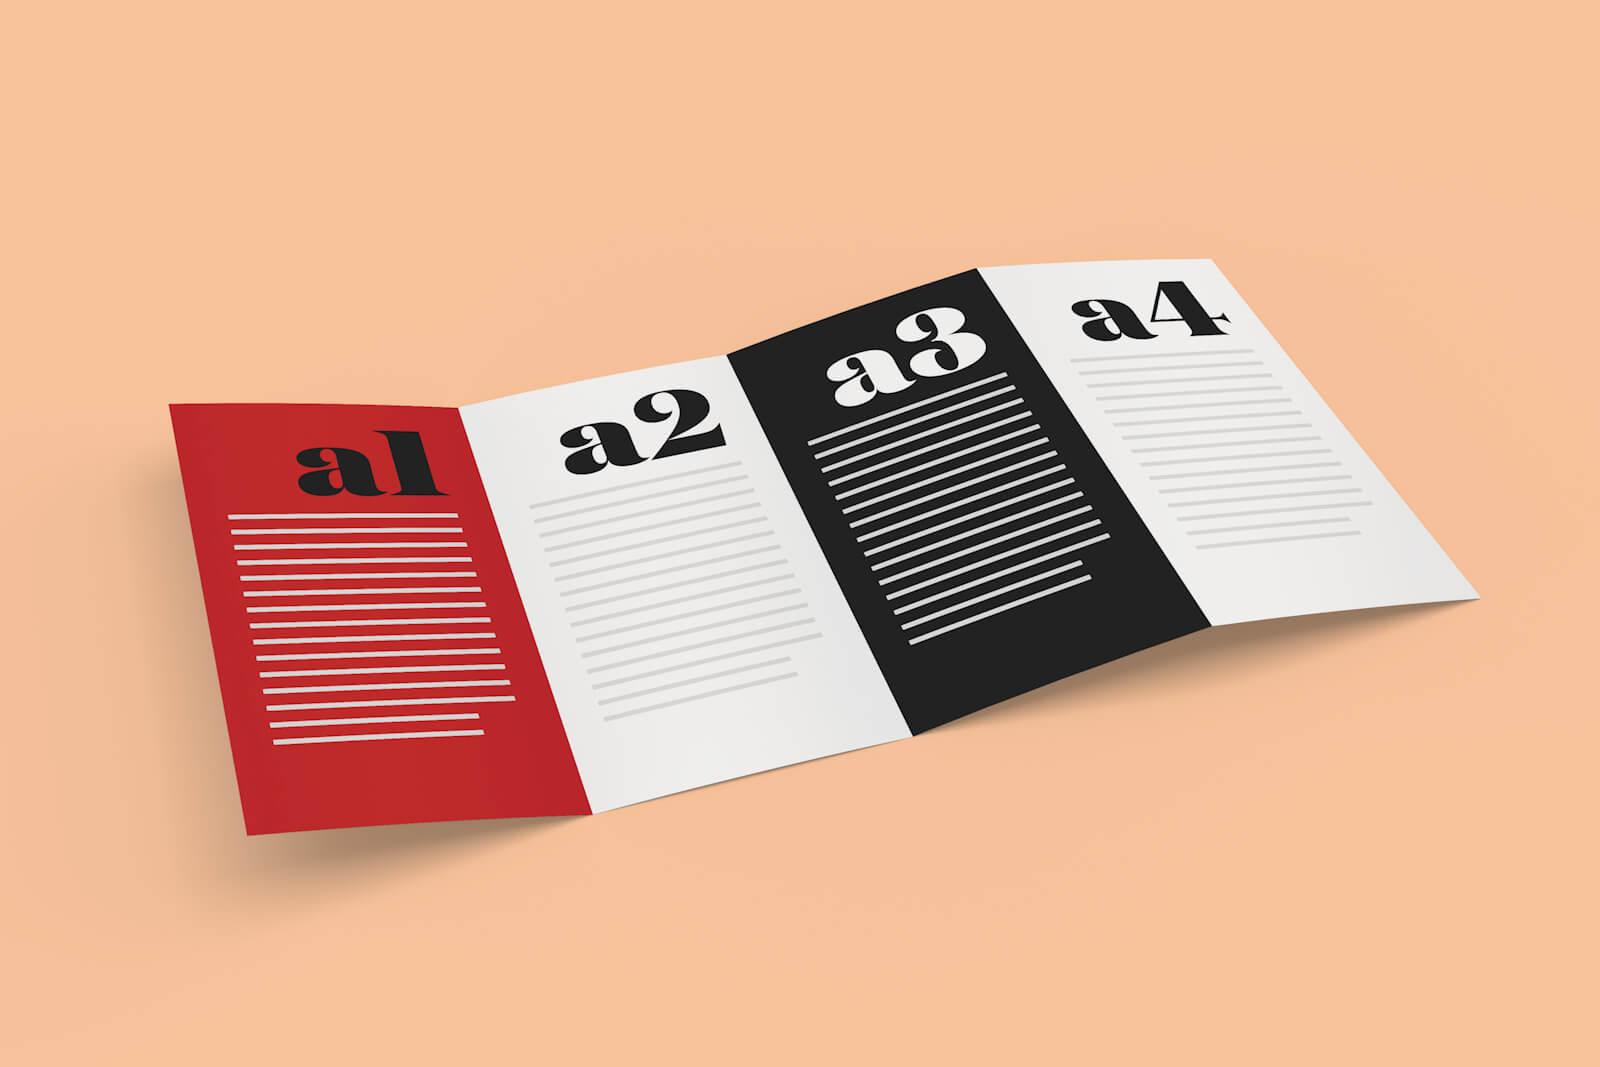 Free 4-Panel Quad-Fold Brochure Mockup Psd - Good Mockups with regard to Quad Fold Brochure Template